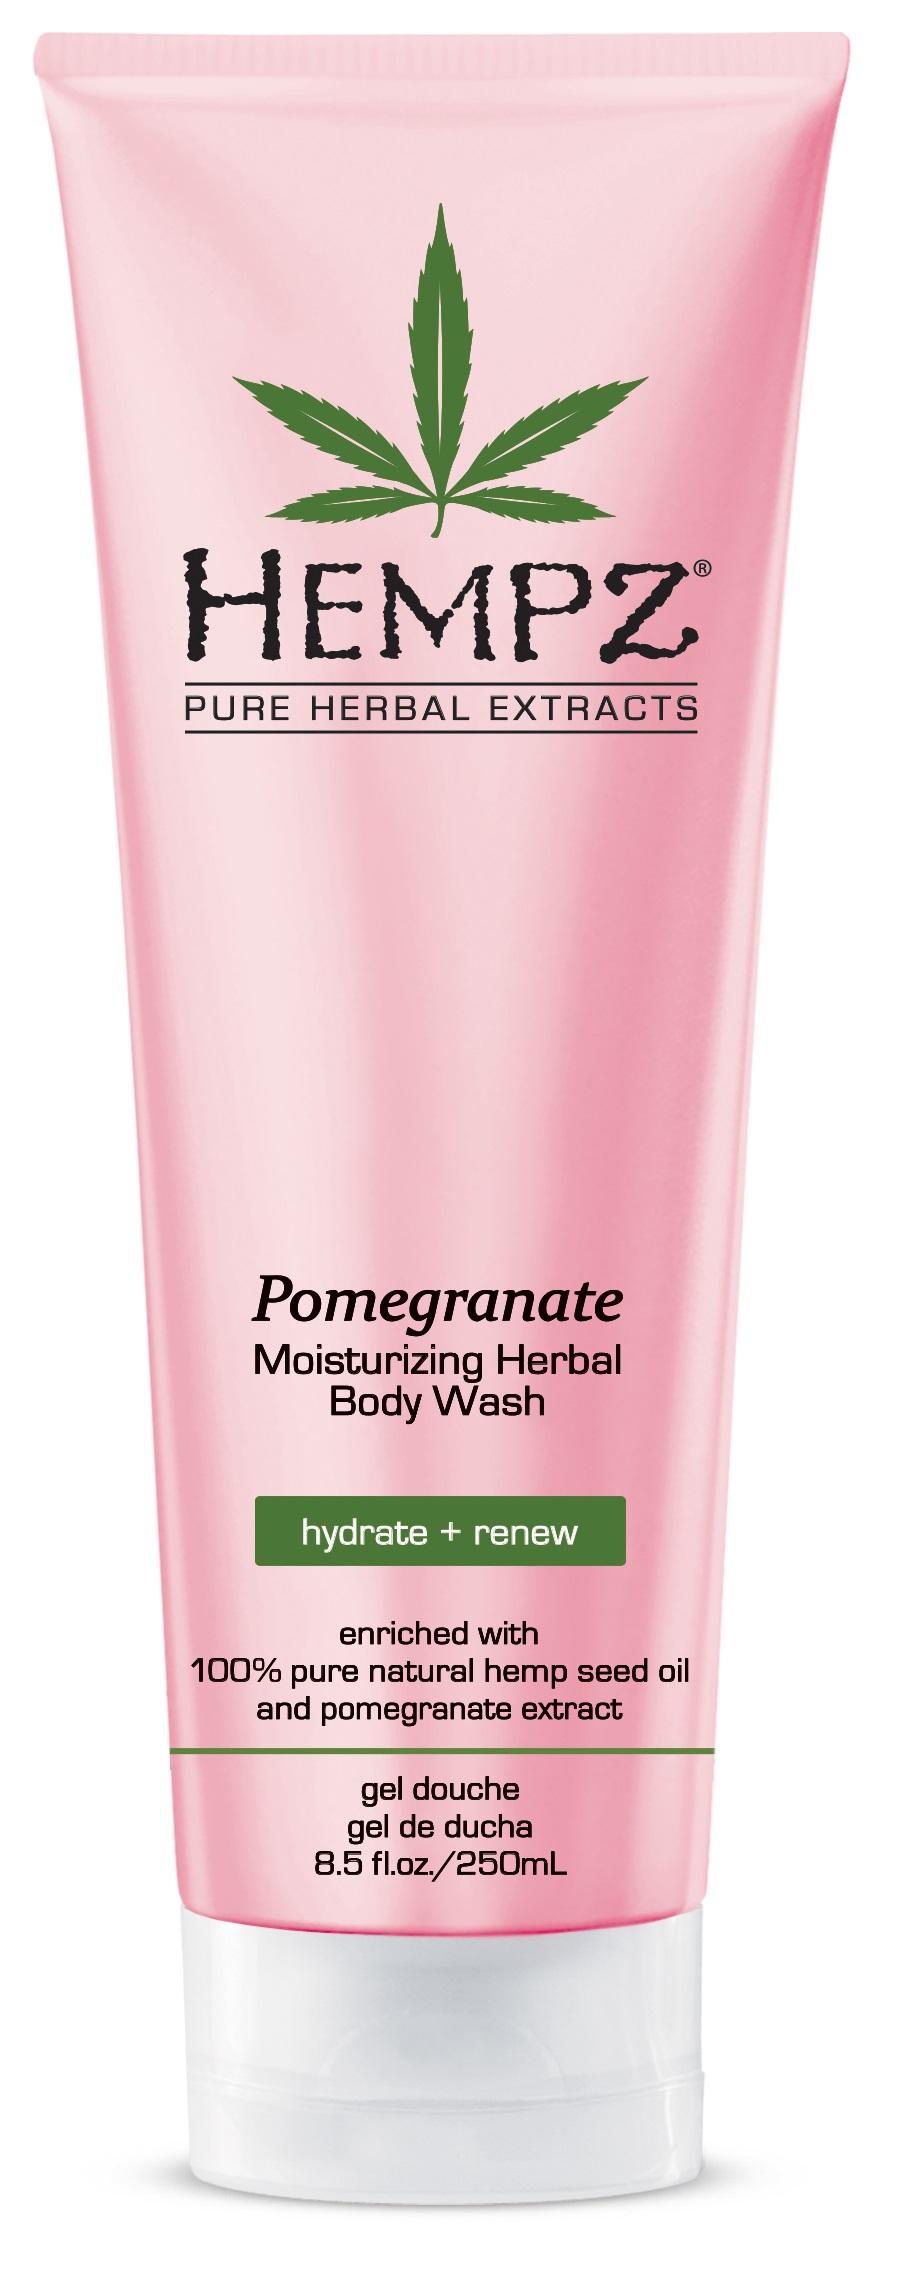 Image of Hempz Pomegranate Herbal Body Wash